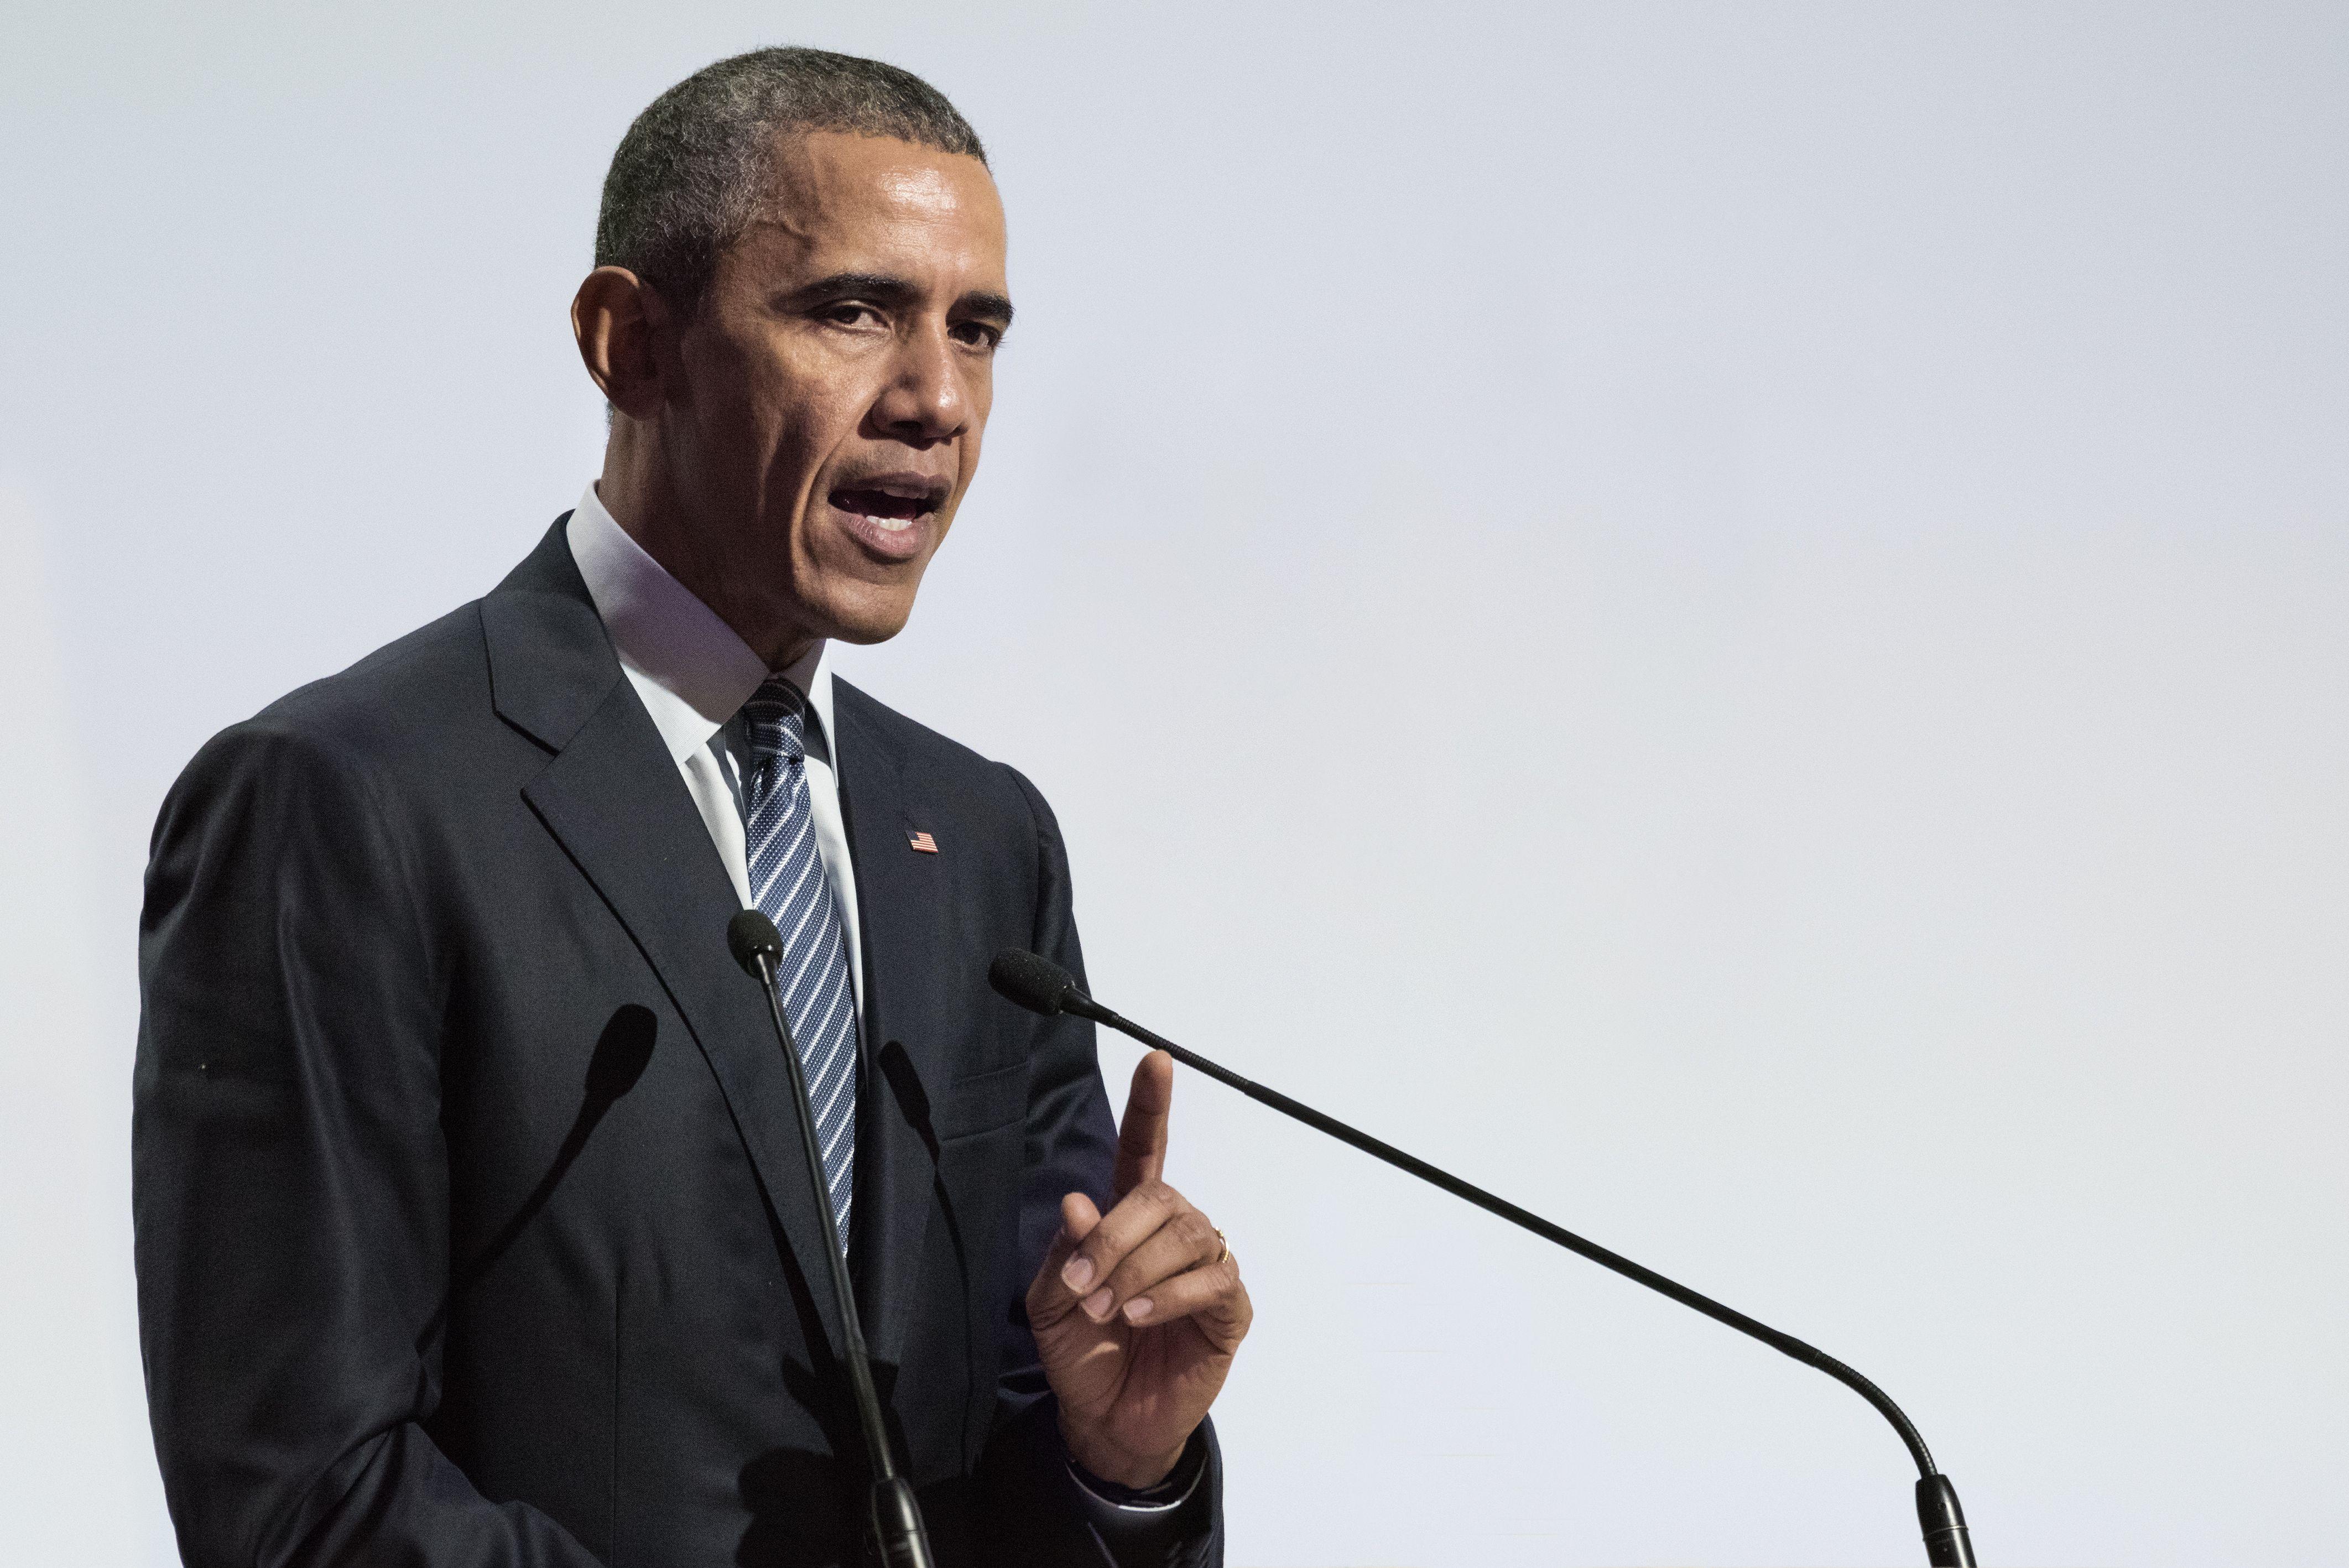 Obama Administration Steps Up Efforts to Beat Painkiller, Heroin Epidemic